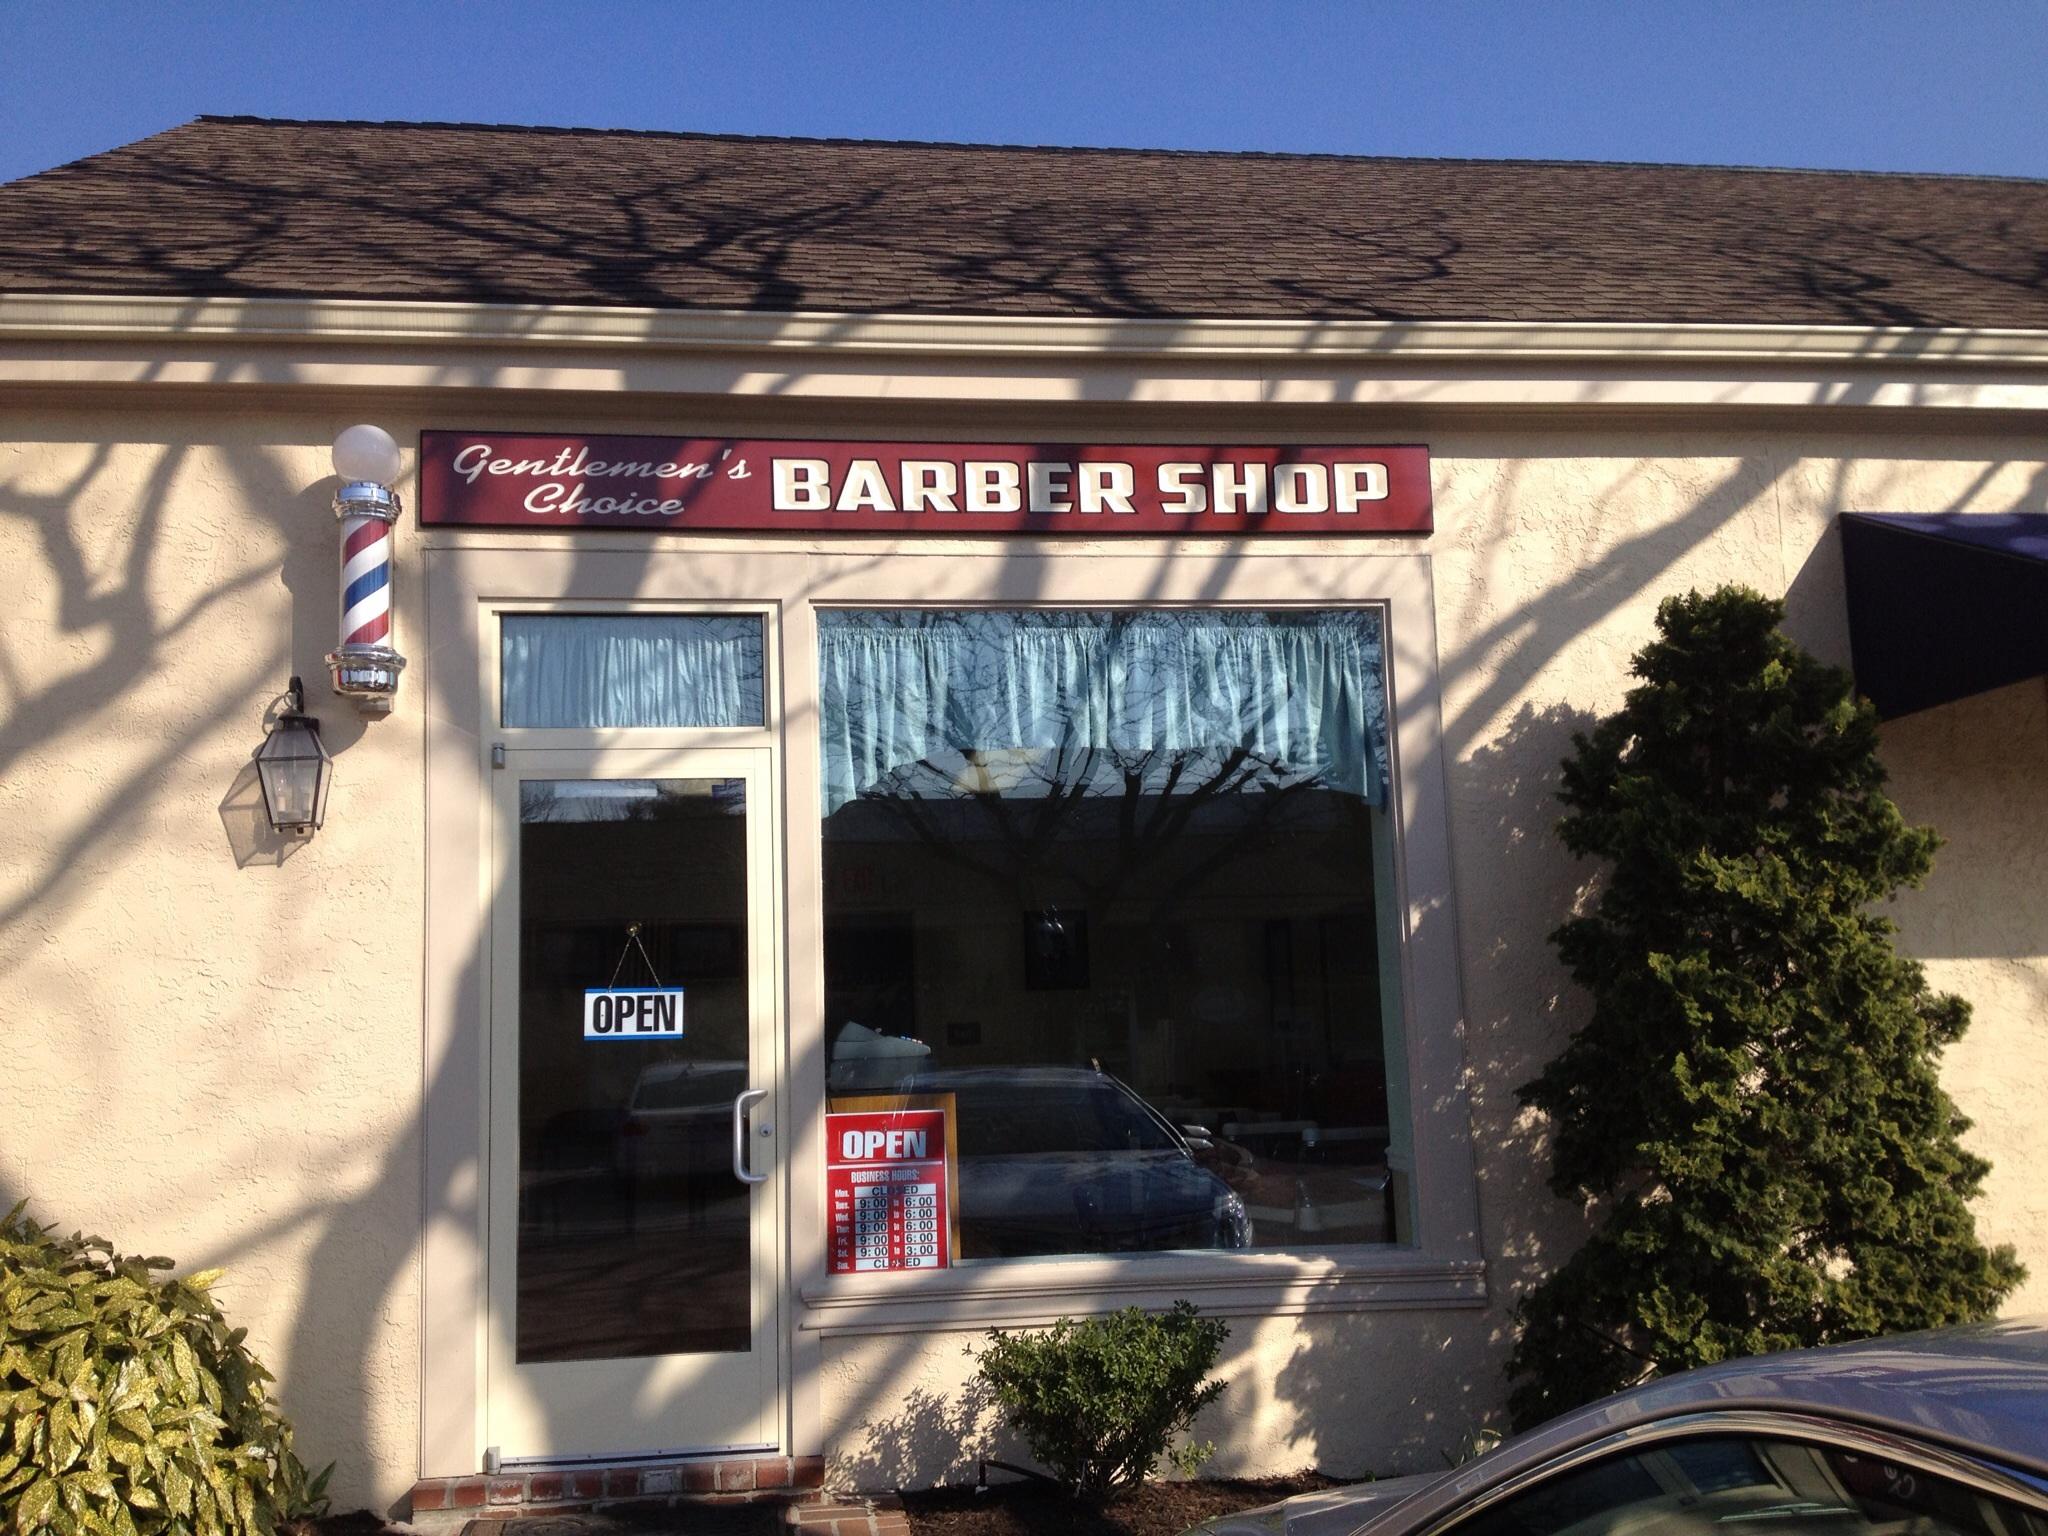 Gentlemen's Choice Barber Shop - Wayne, PA - Beauty Salons & Hair Care